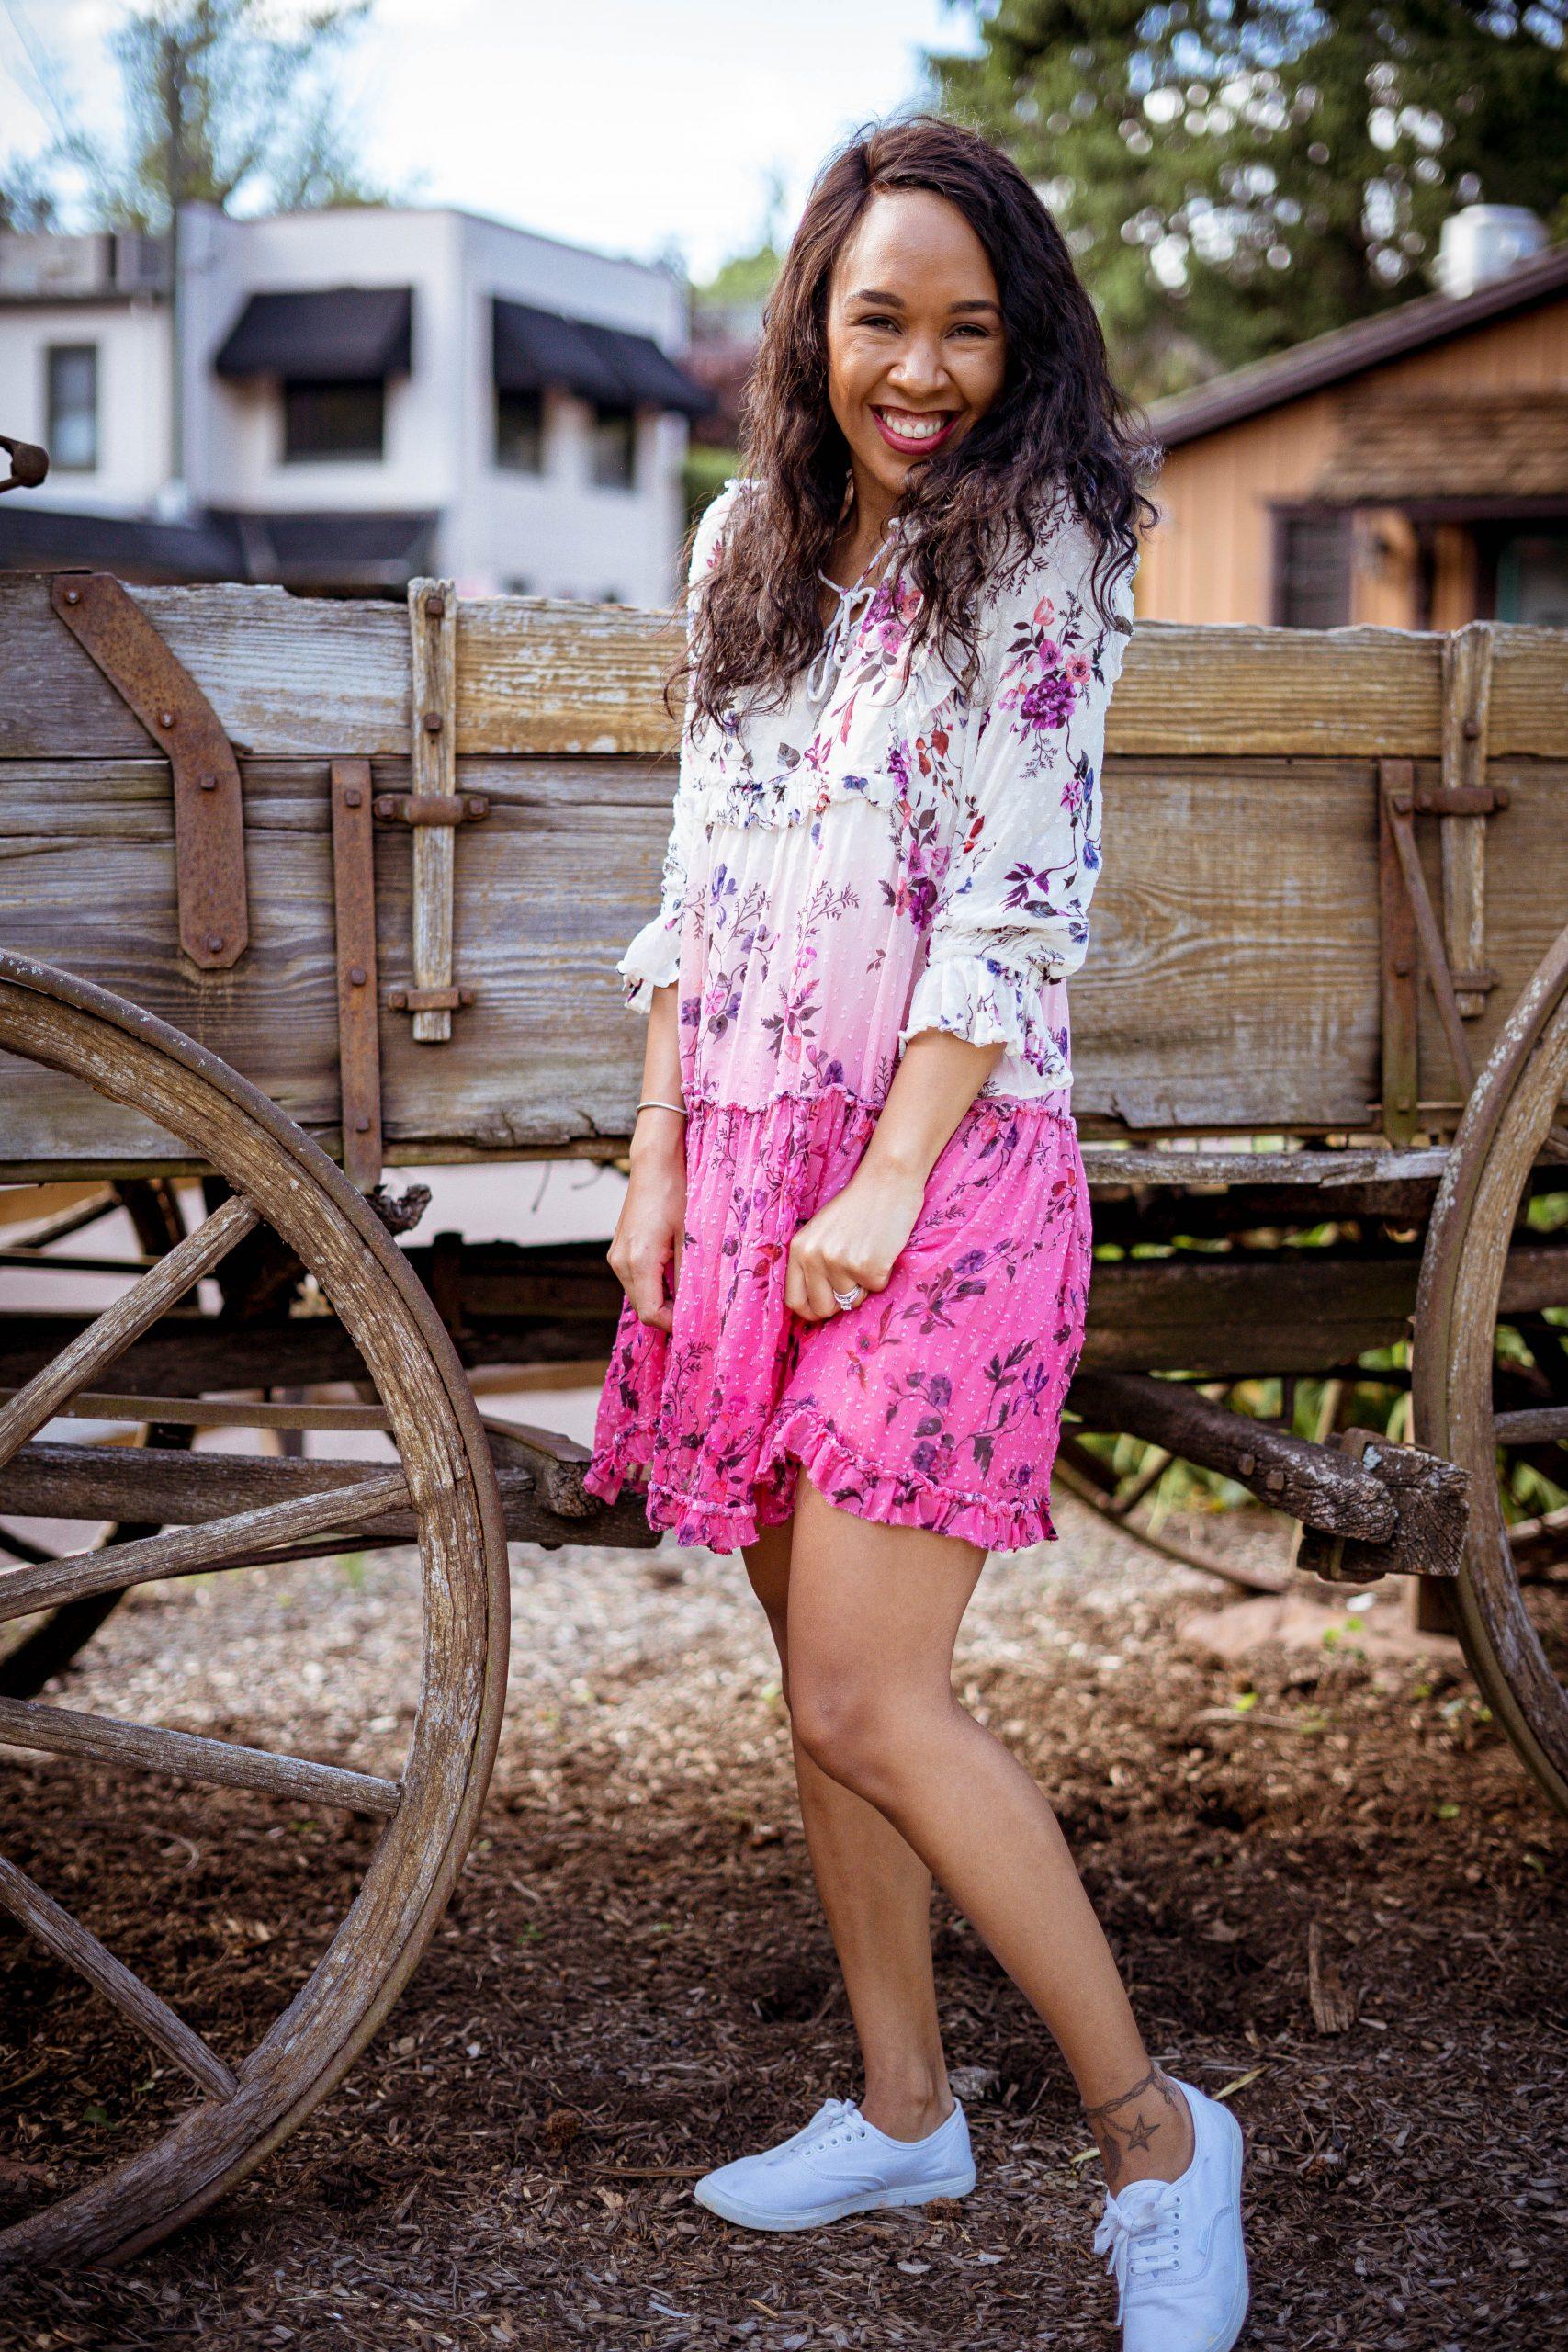 livinglesh wearing ombre dress